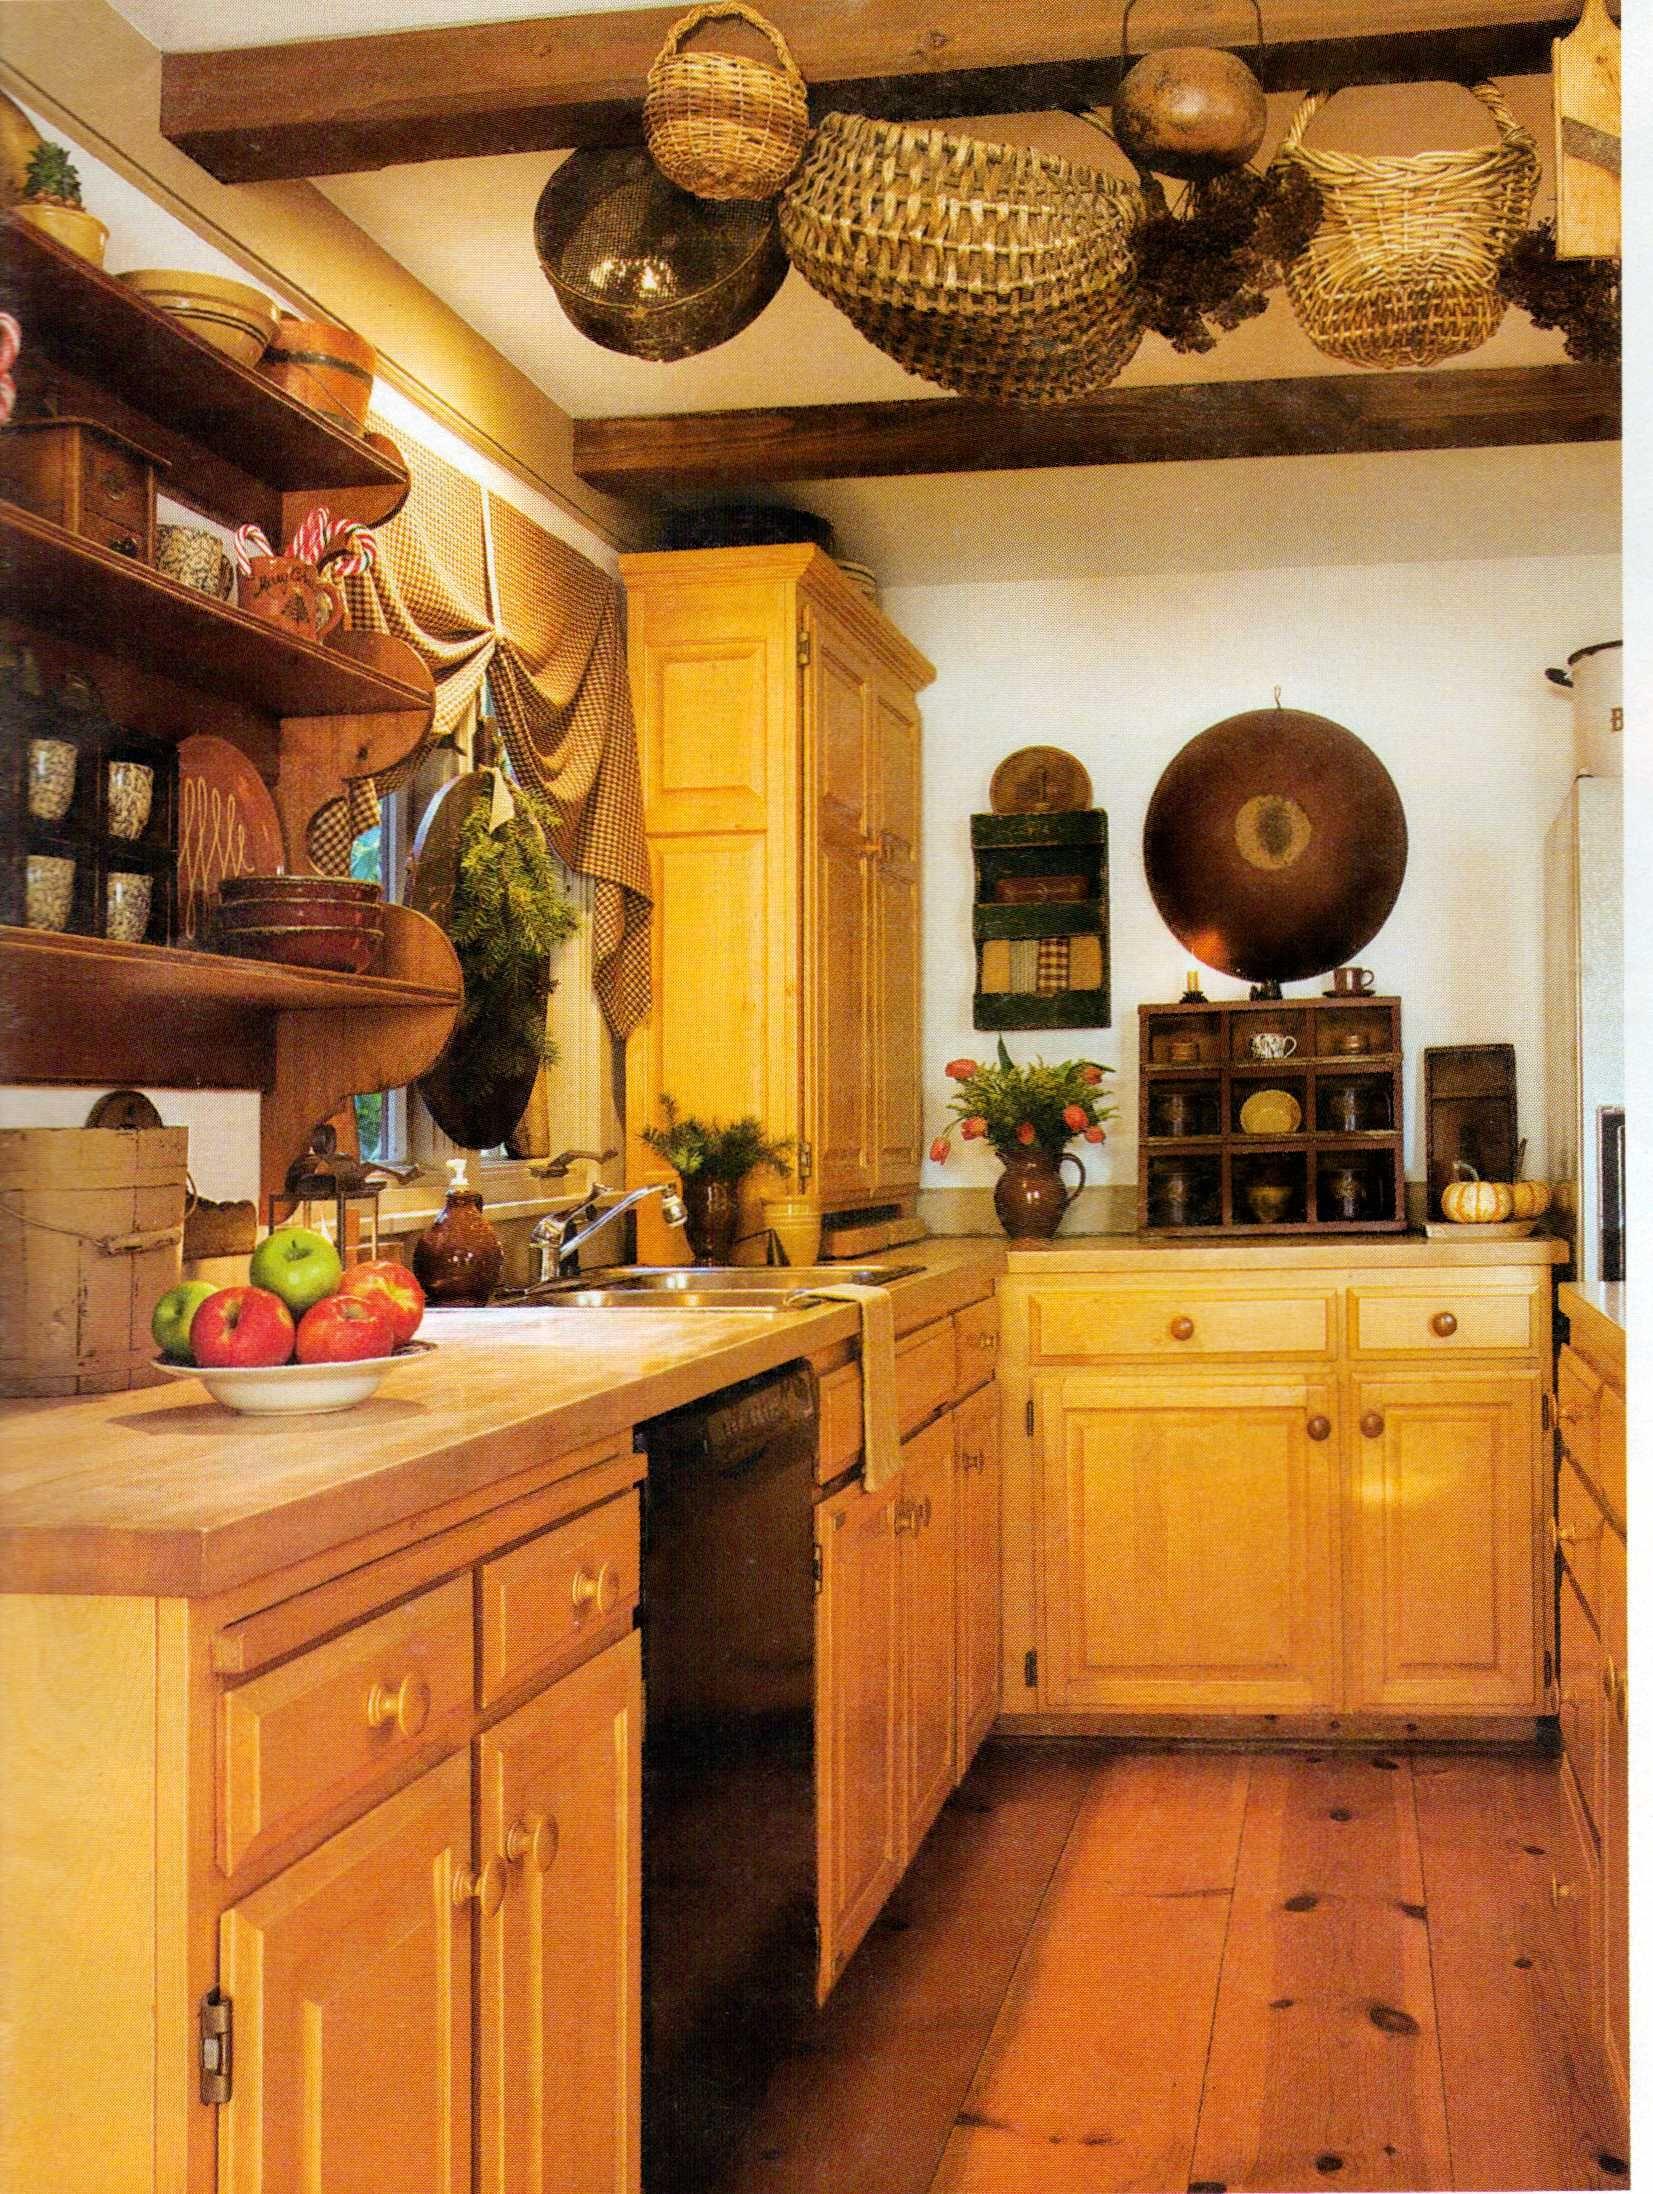 Country Kitchen | Primitive Decor | Country kitchen, Rustic kitchen design, Green kitchen decor